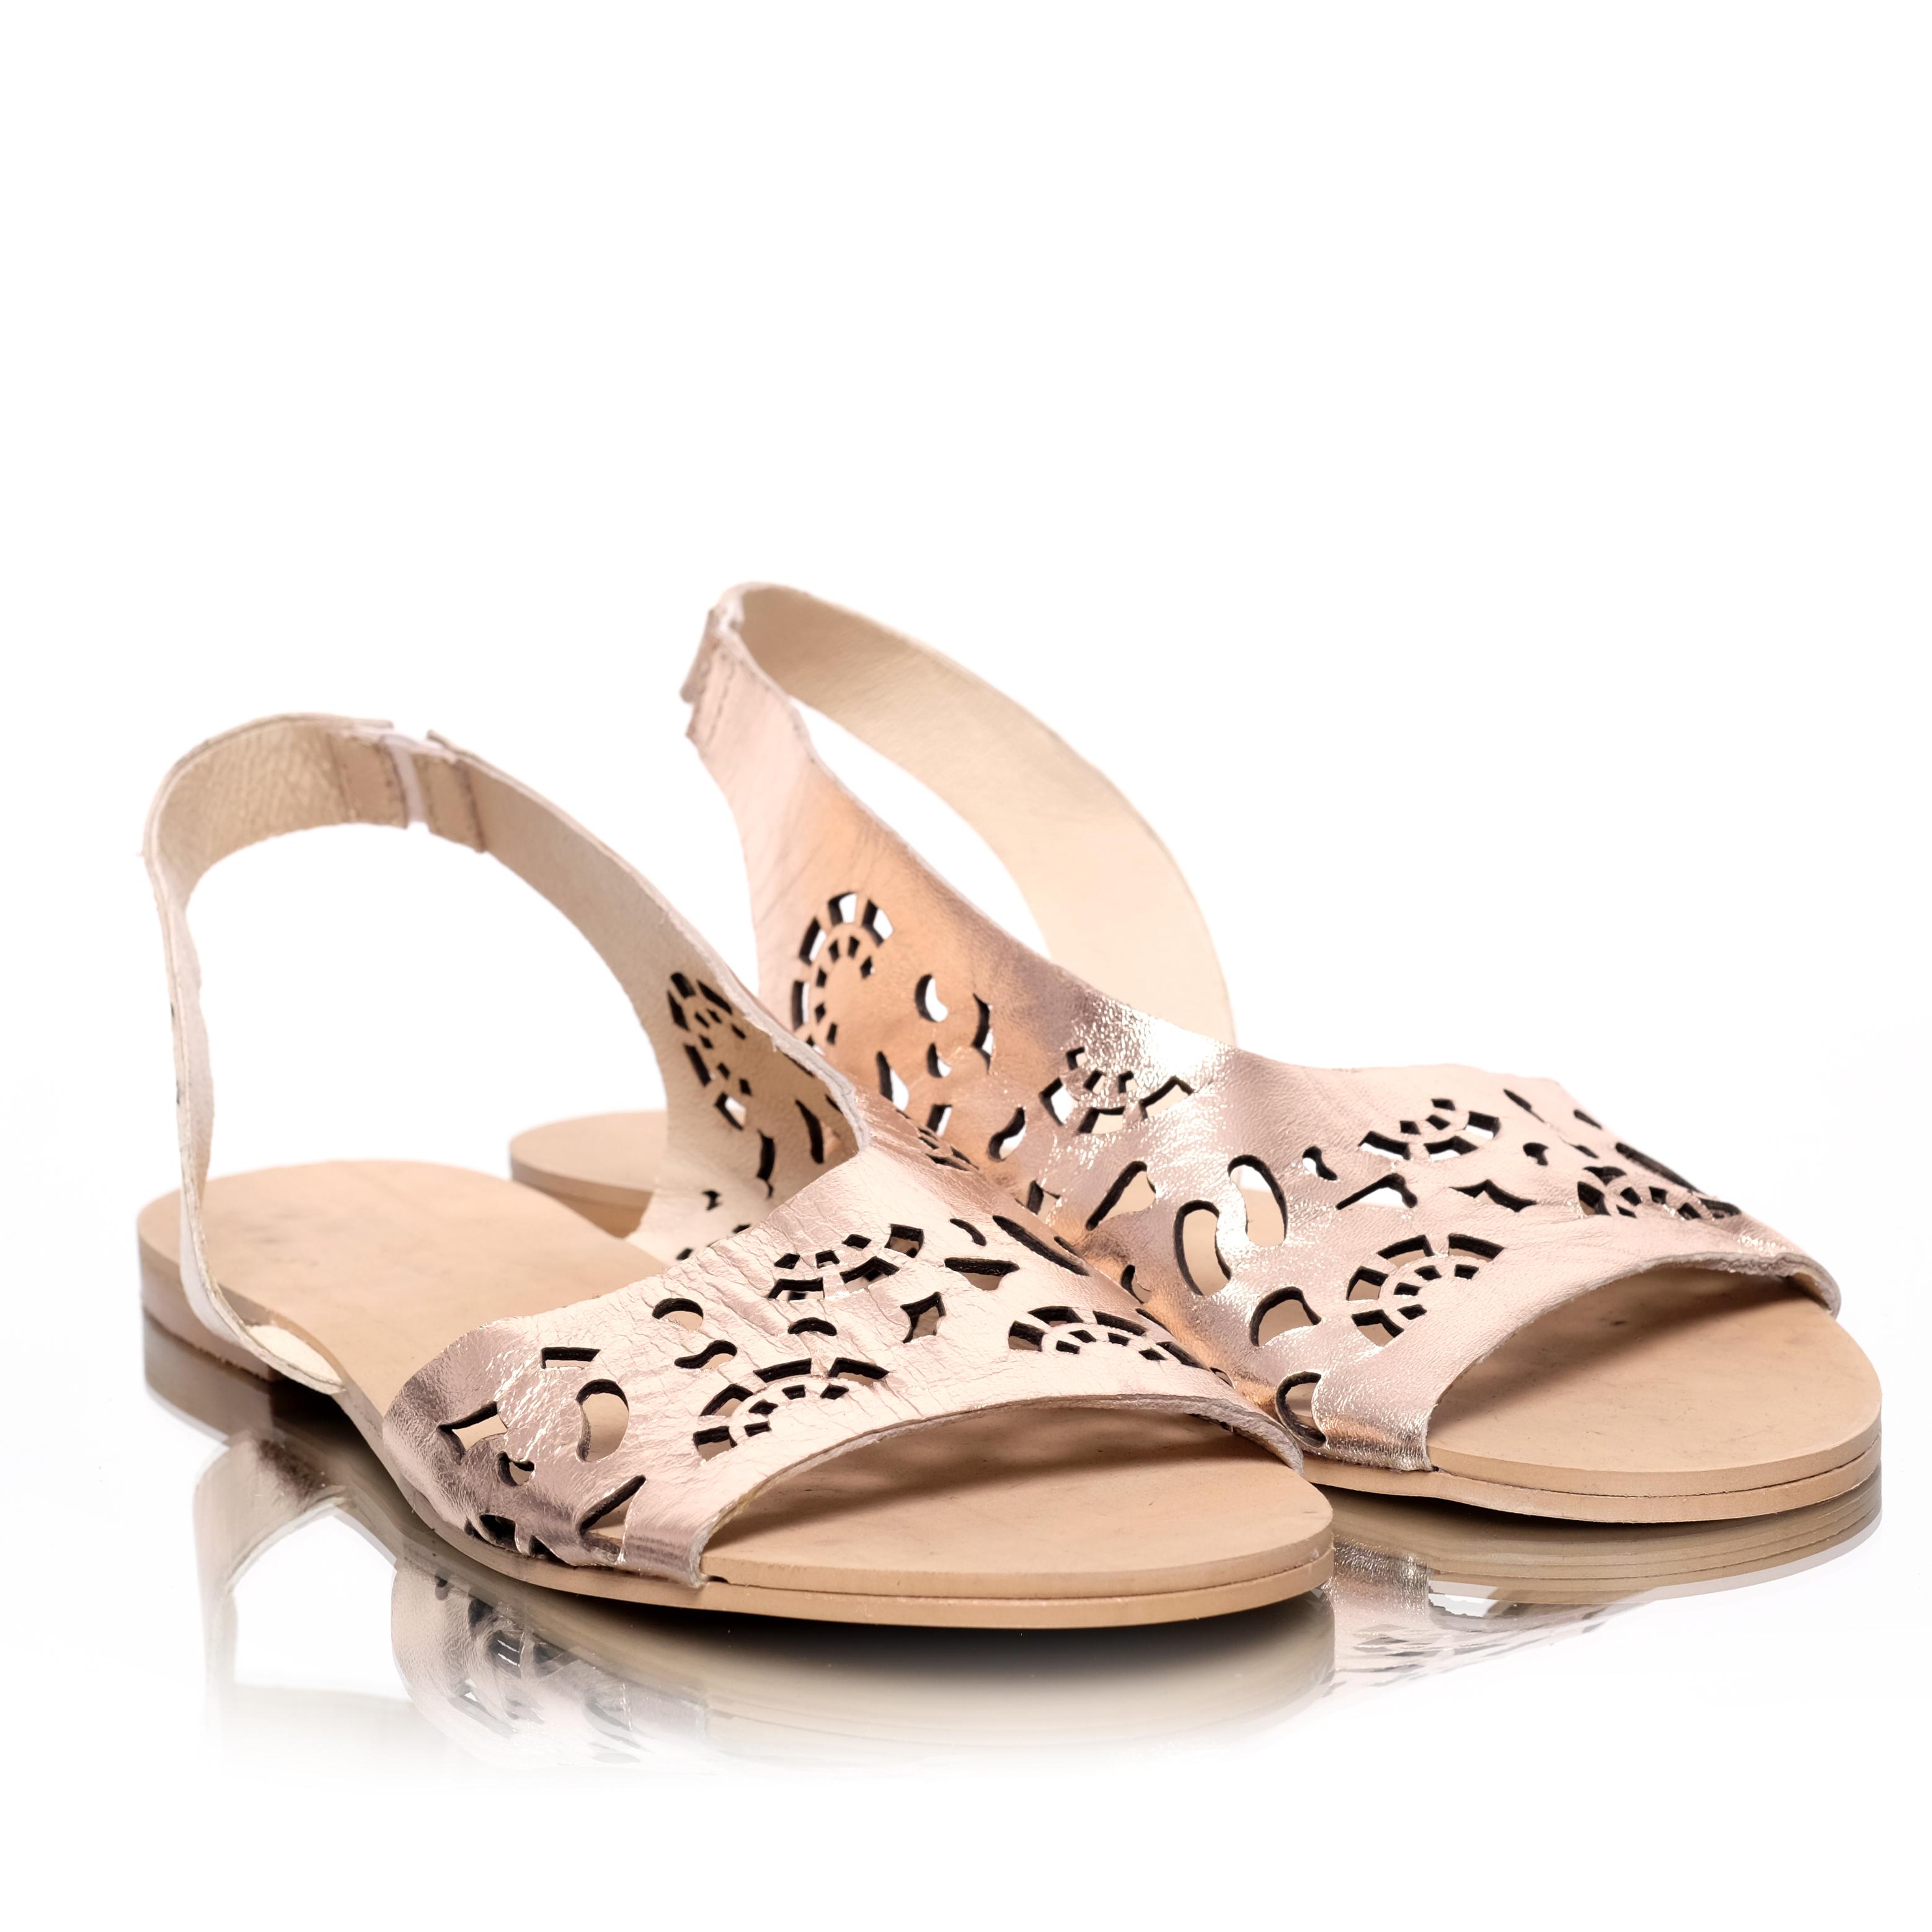 eaac8eb16e66 Sandale de dama metalizate din piele naturala cu talpa joasa Pantofini Agora